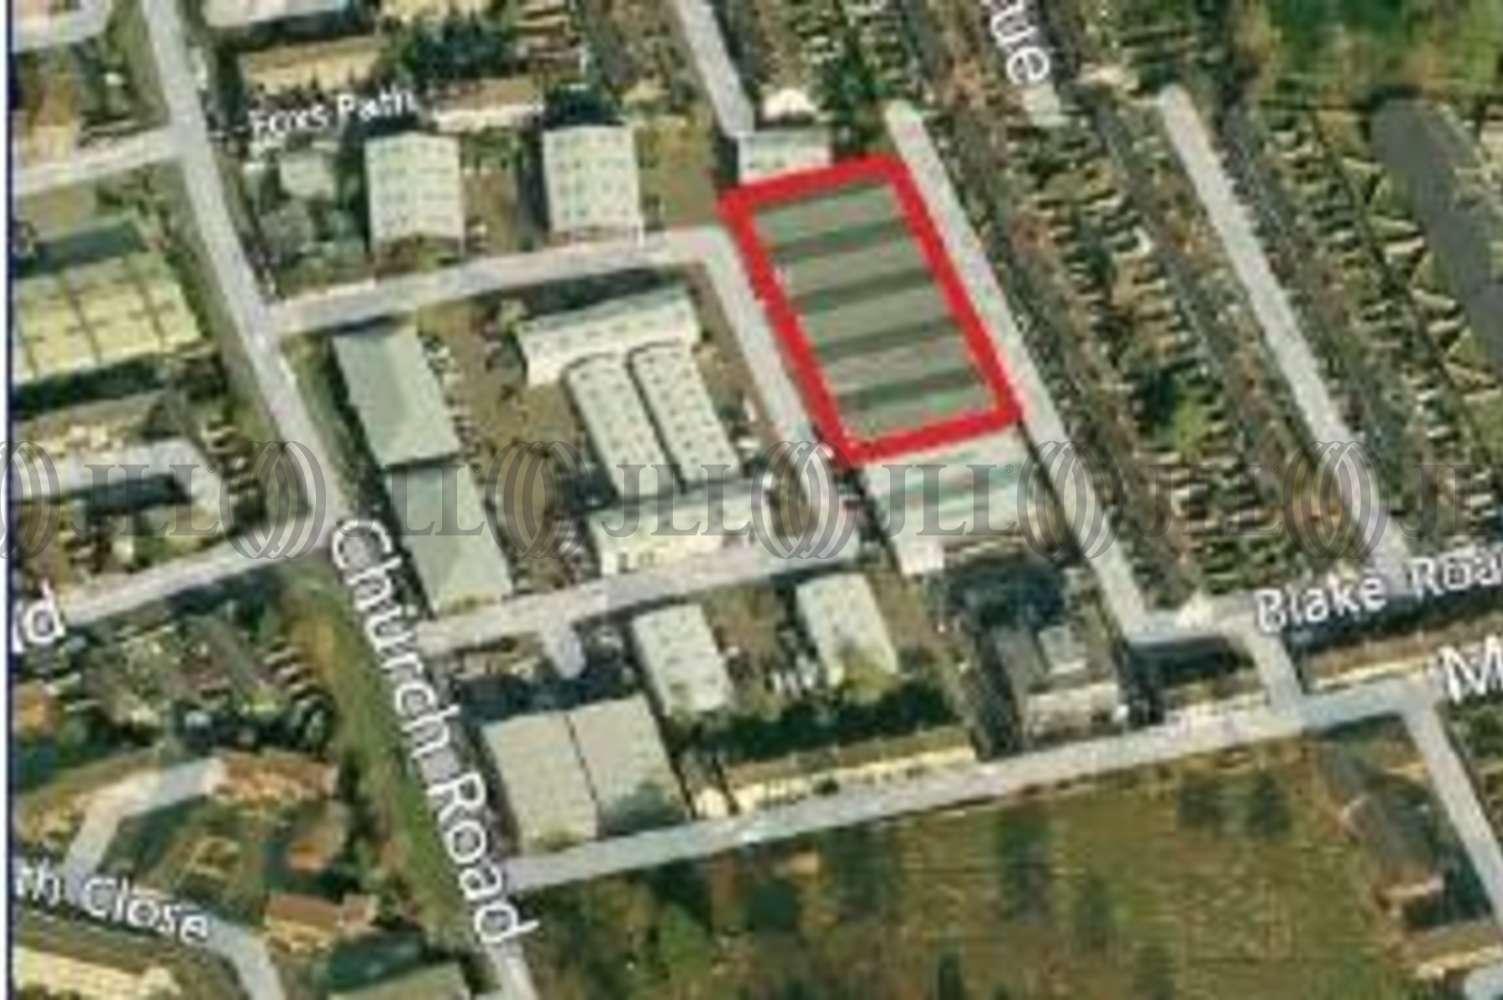 Industrial Mitcham, CR4 3TD - Unit 18-22 Boundary Business Court - 22